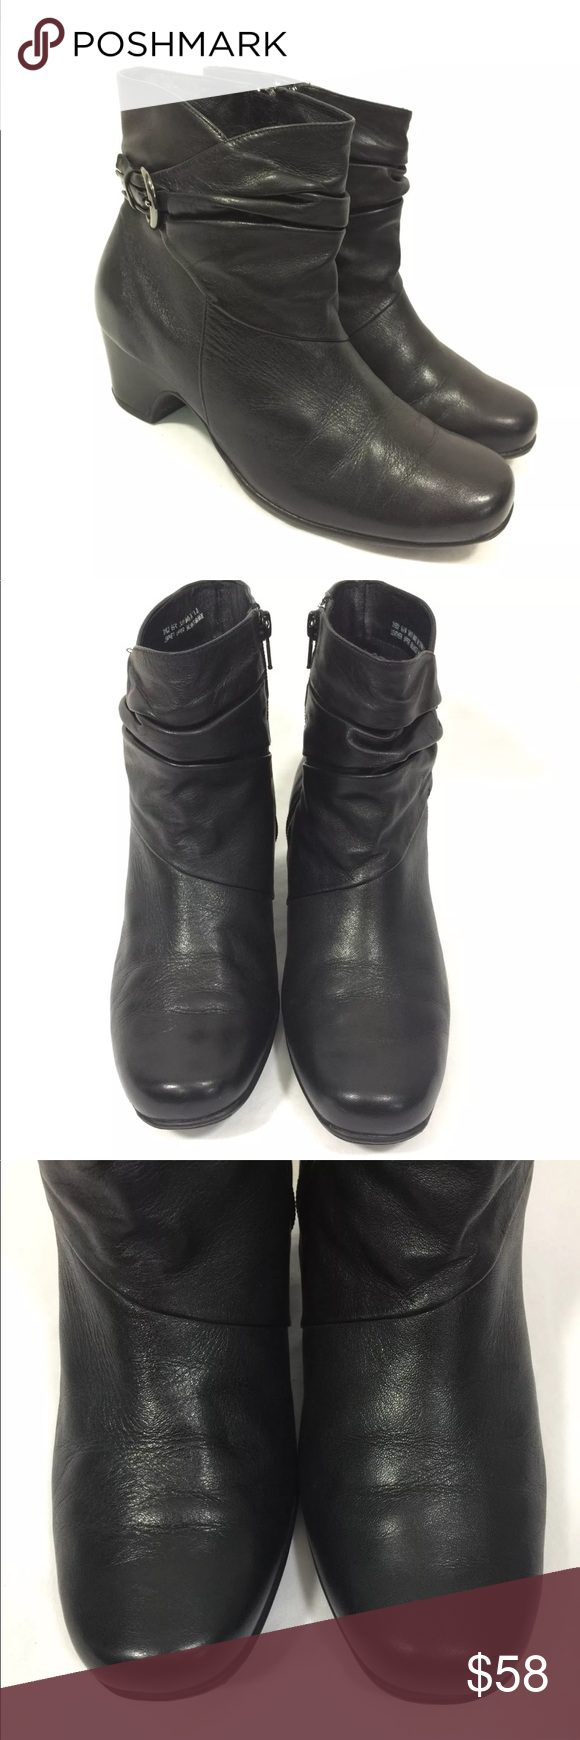 Clarks W Artisan 6 Ankle Boots Black Active Wear rrqU1Z